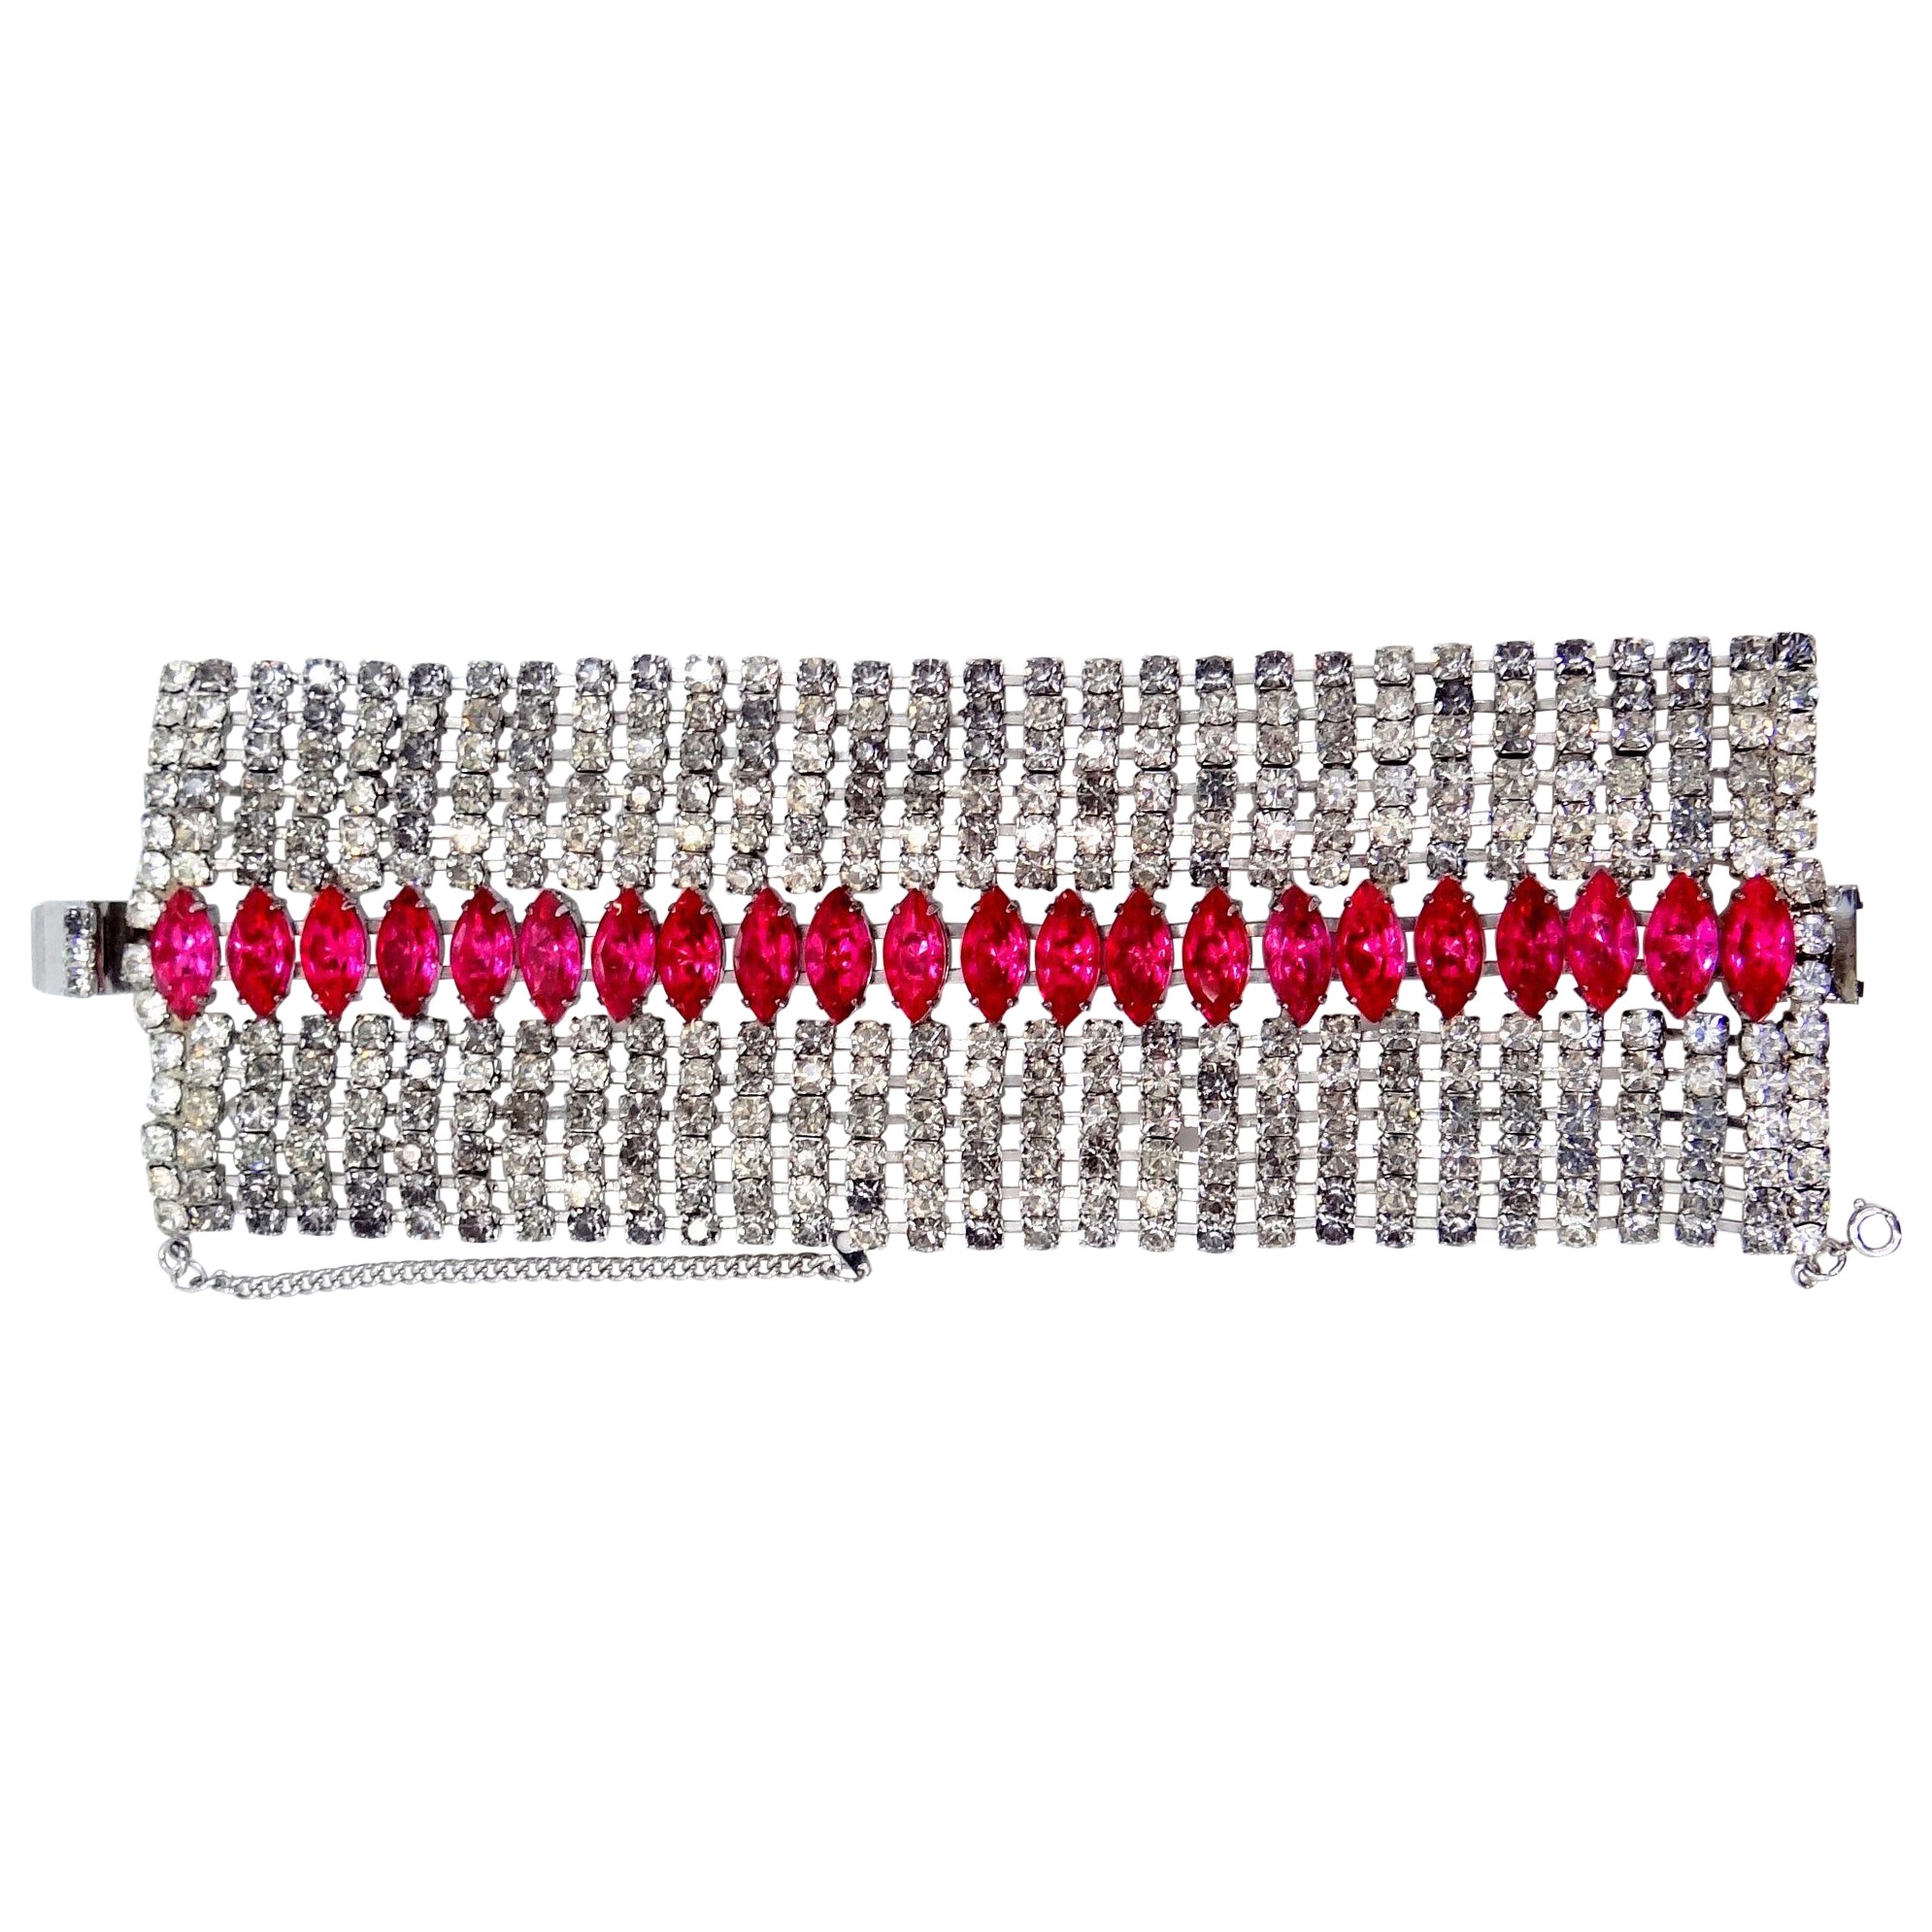 "2 1/2"" Wide Pink & Clear Rhinestones Bracelet"